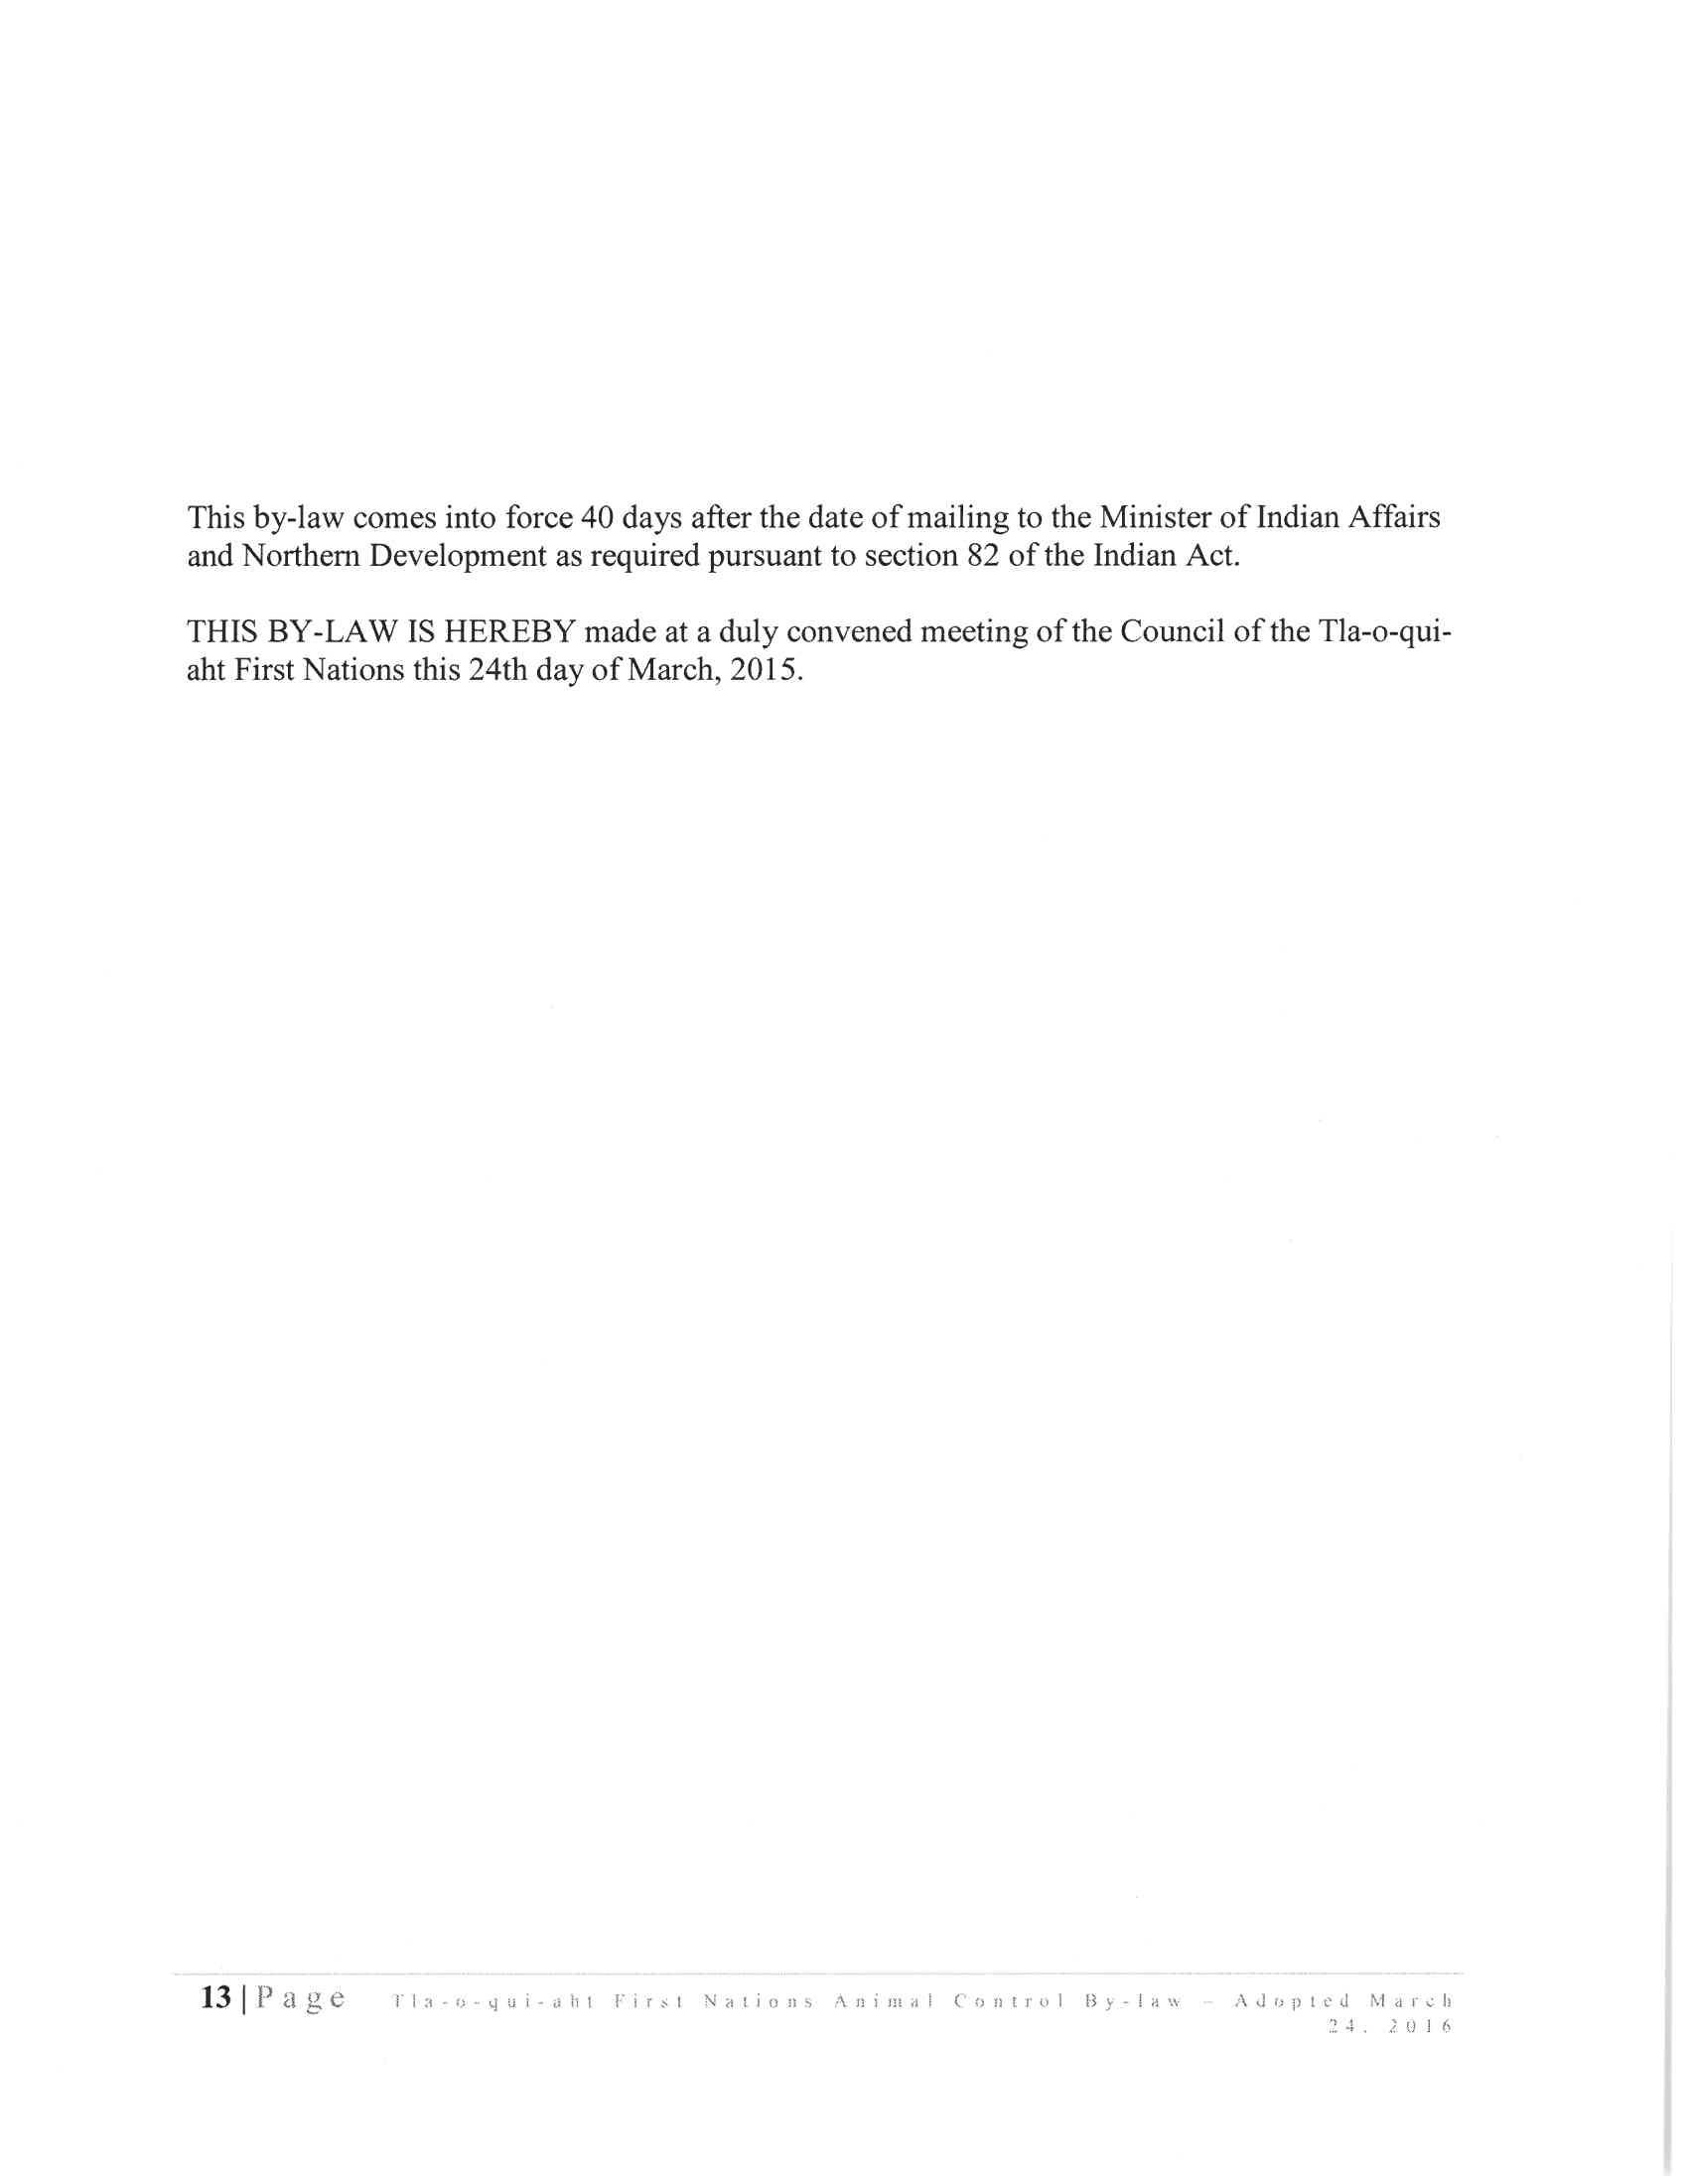 TFN Bulletin Apr 6-2016_Page_35.jpg